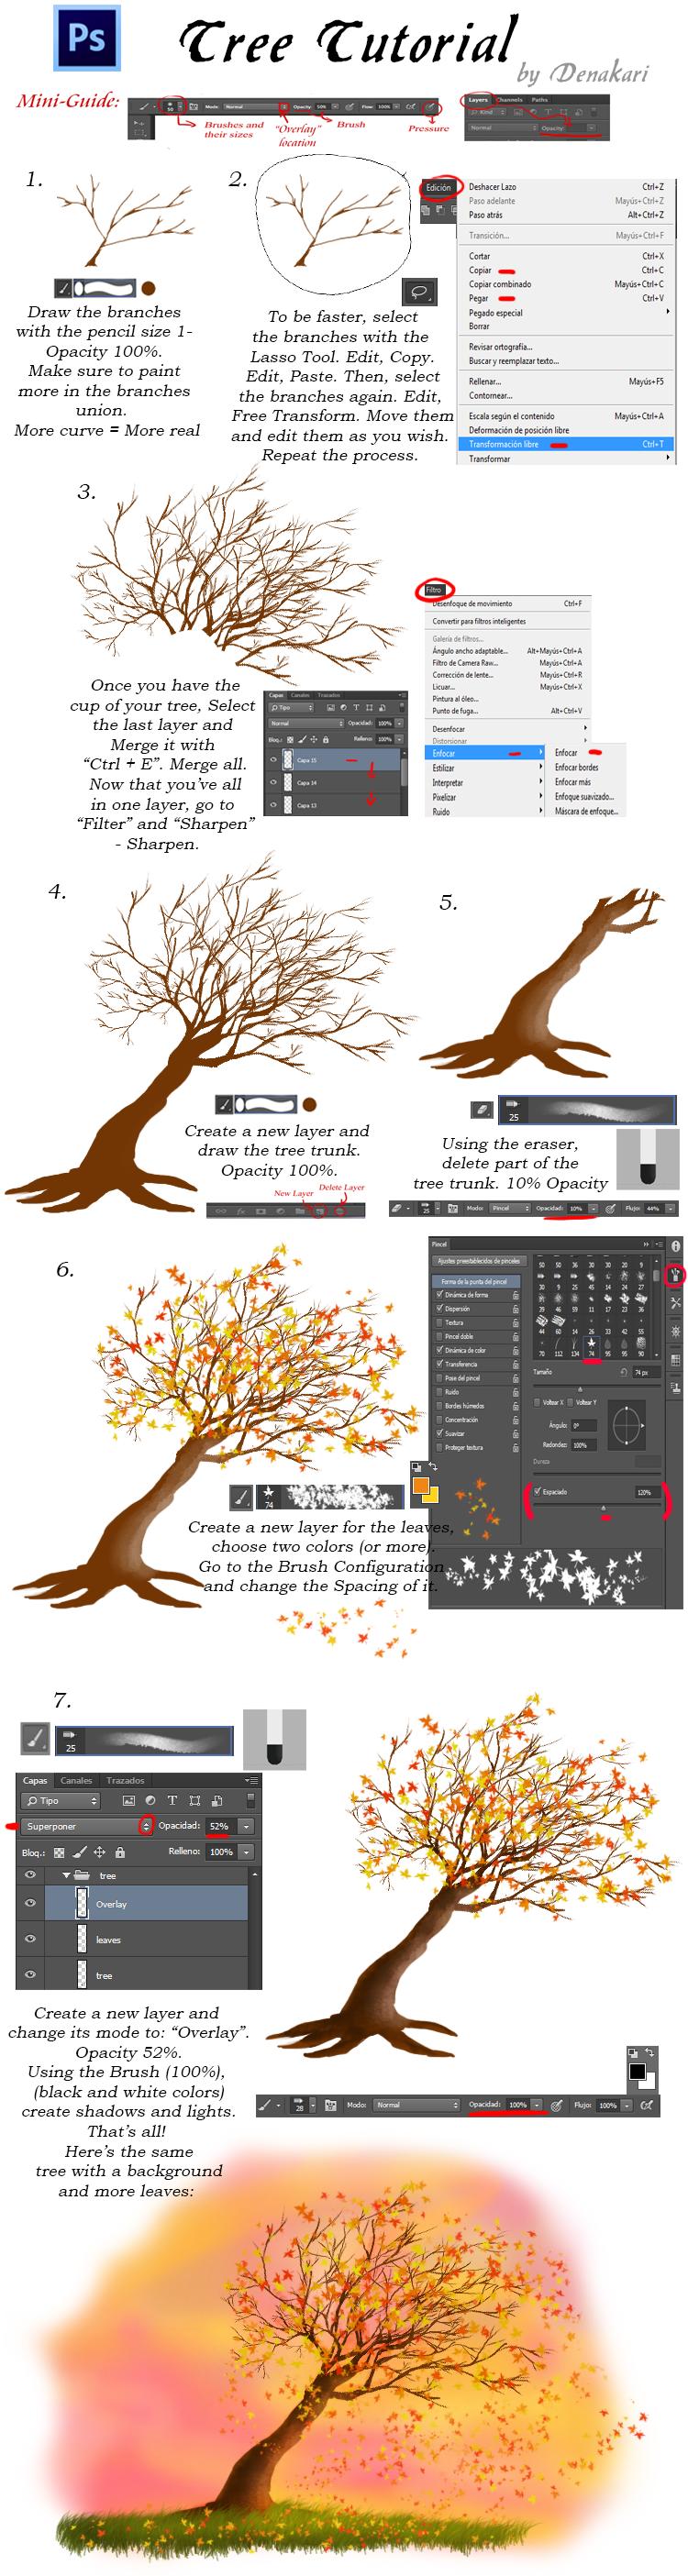 Tree Tutorial - Photoshop CC by Denakari